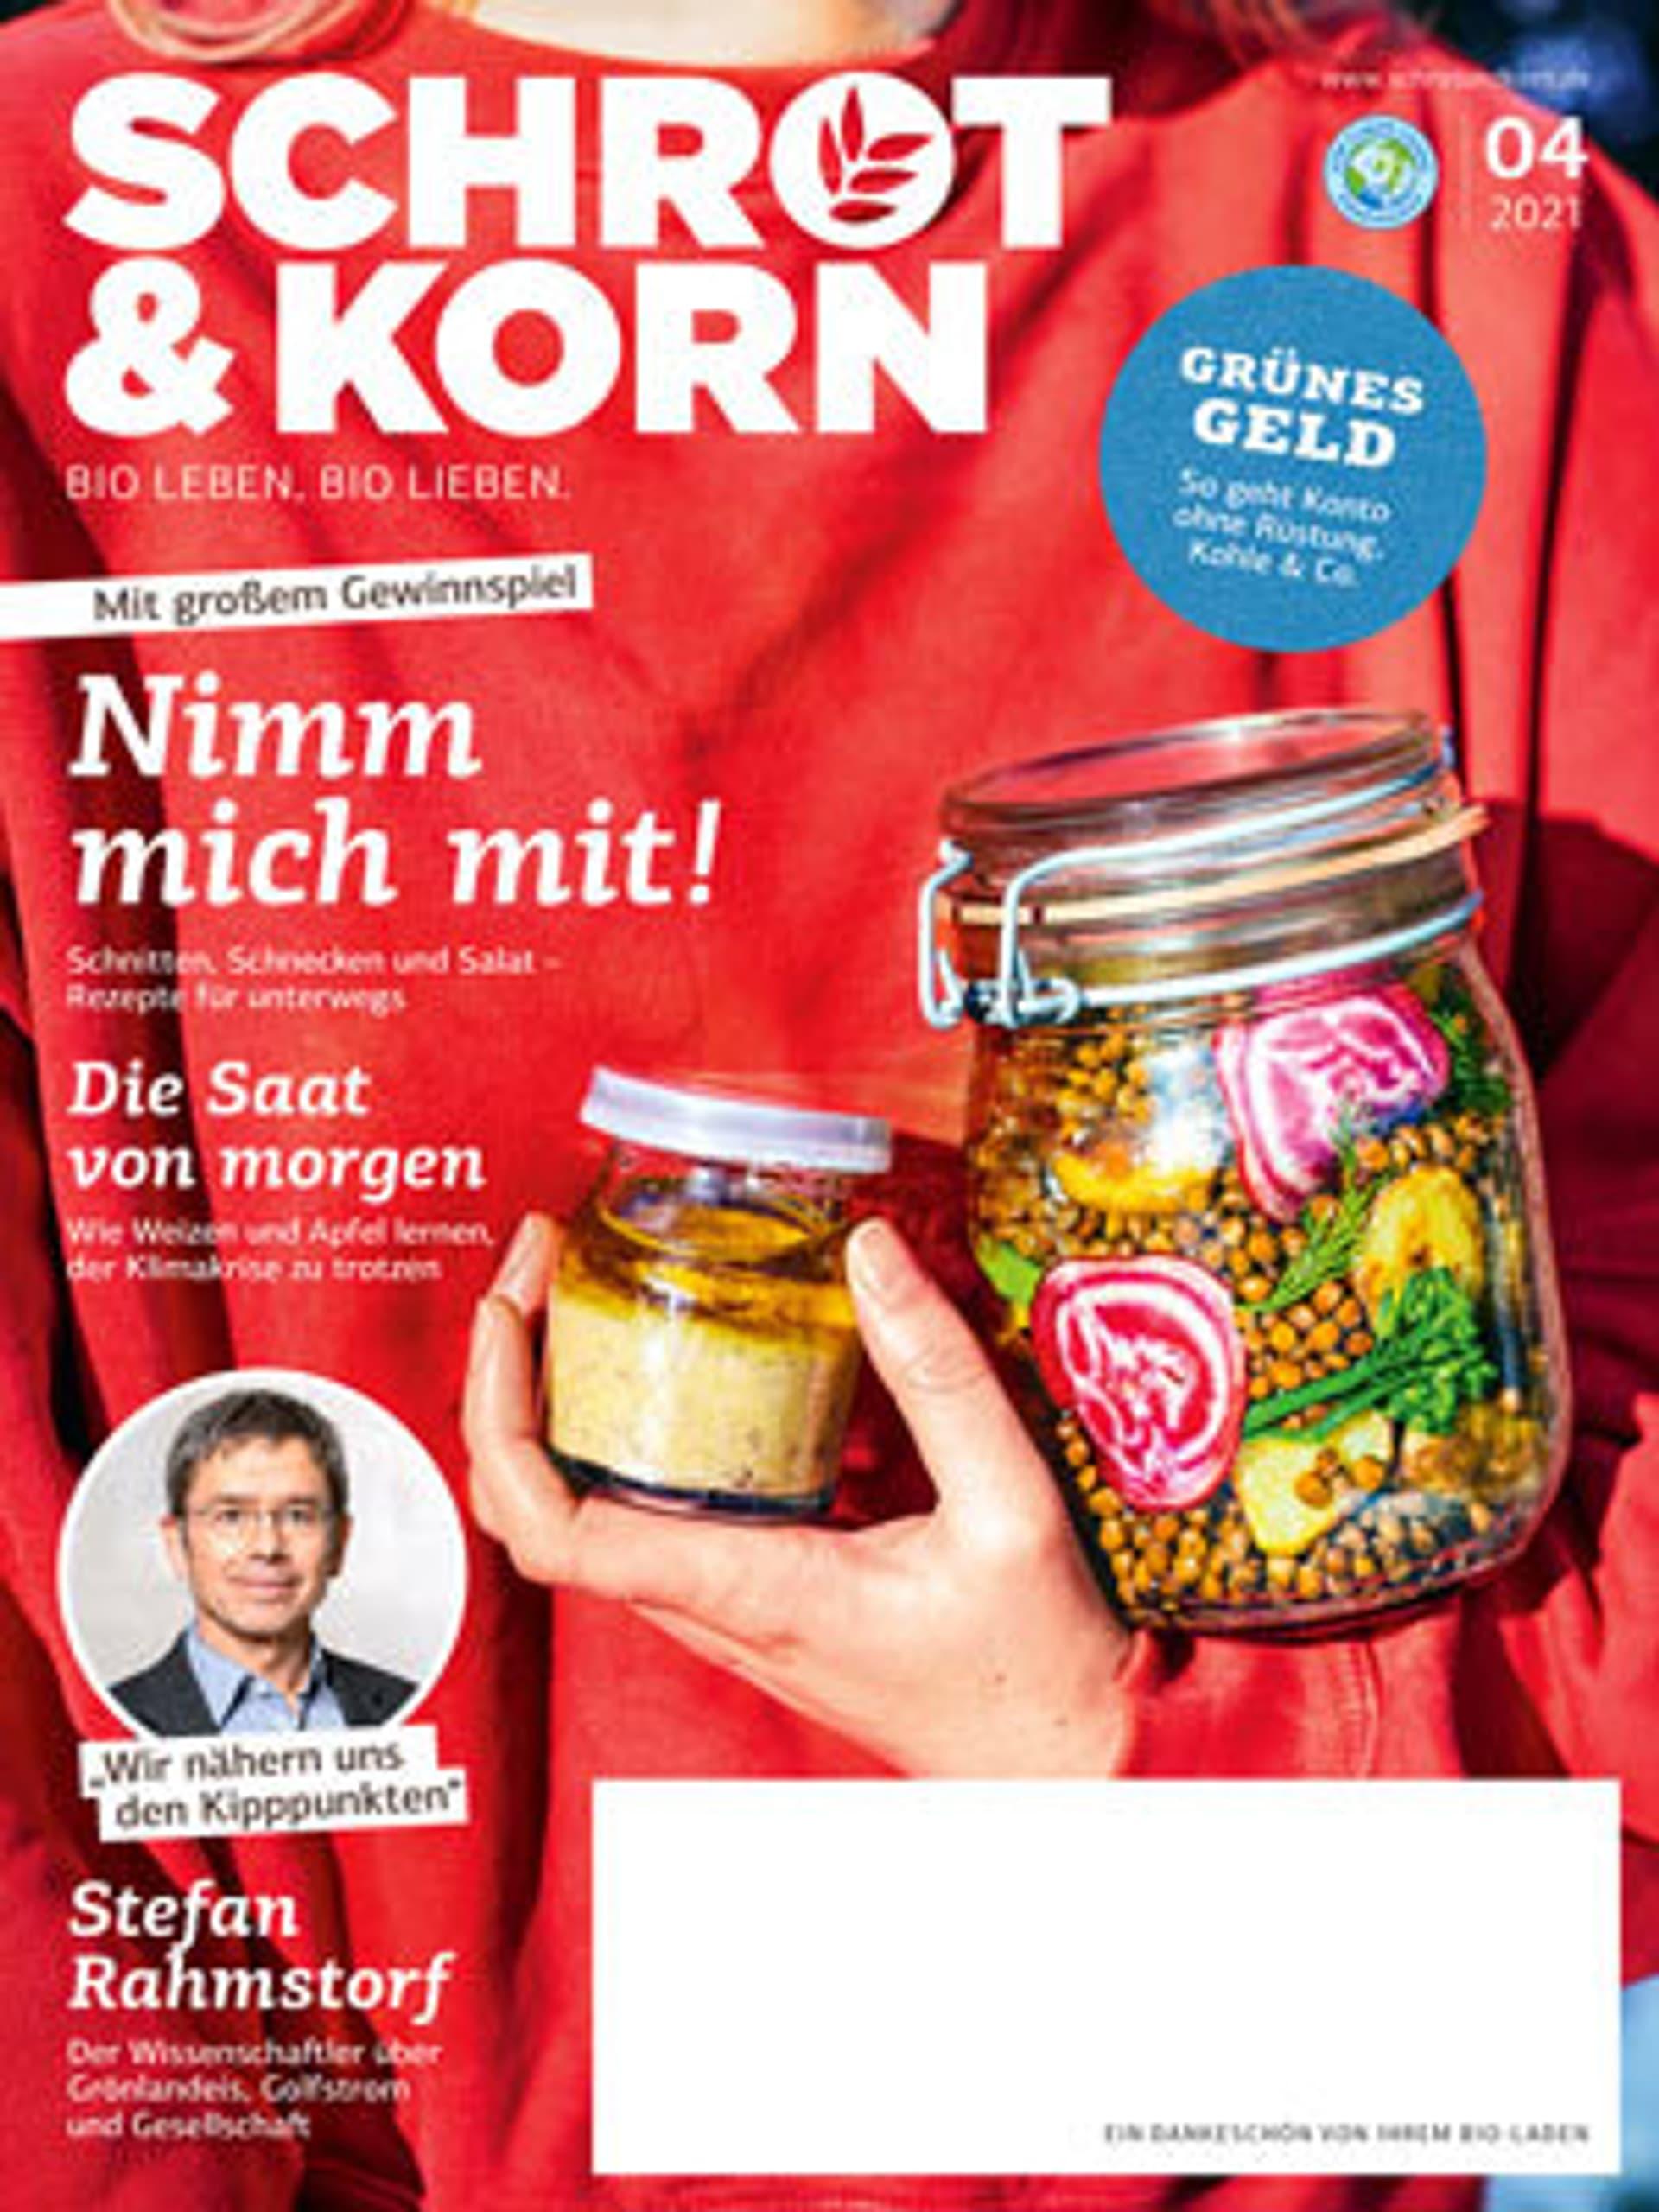 Schrot&Korn Titel 04/2021